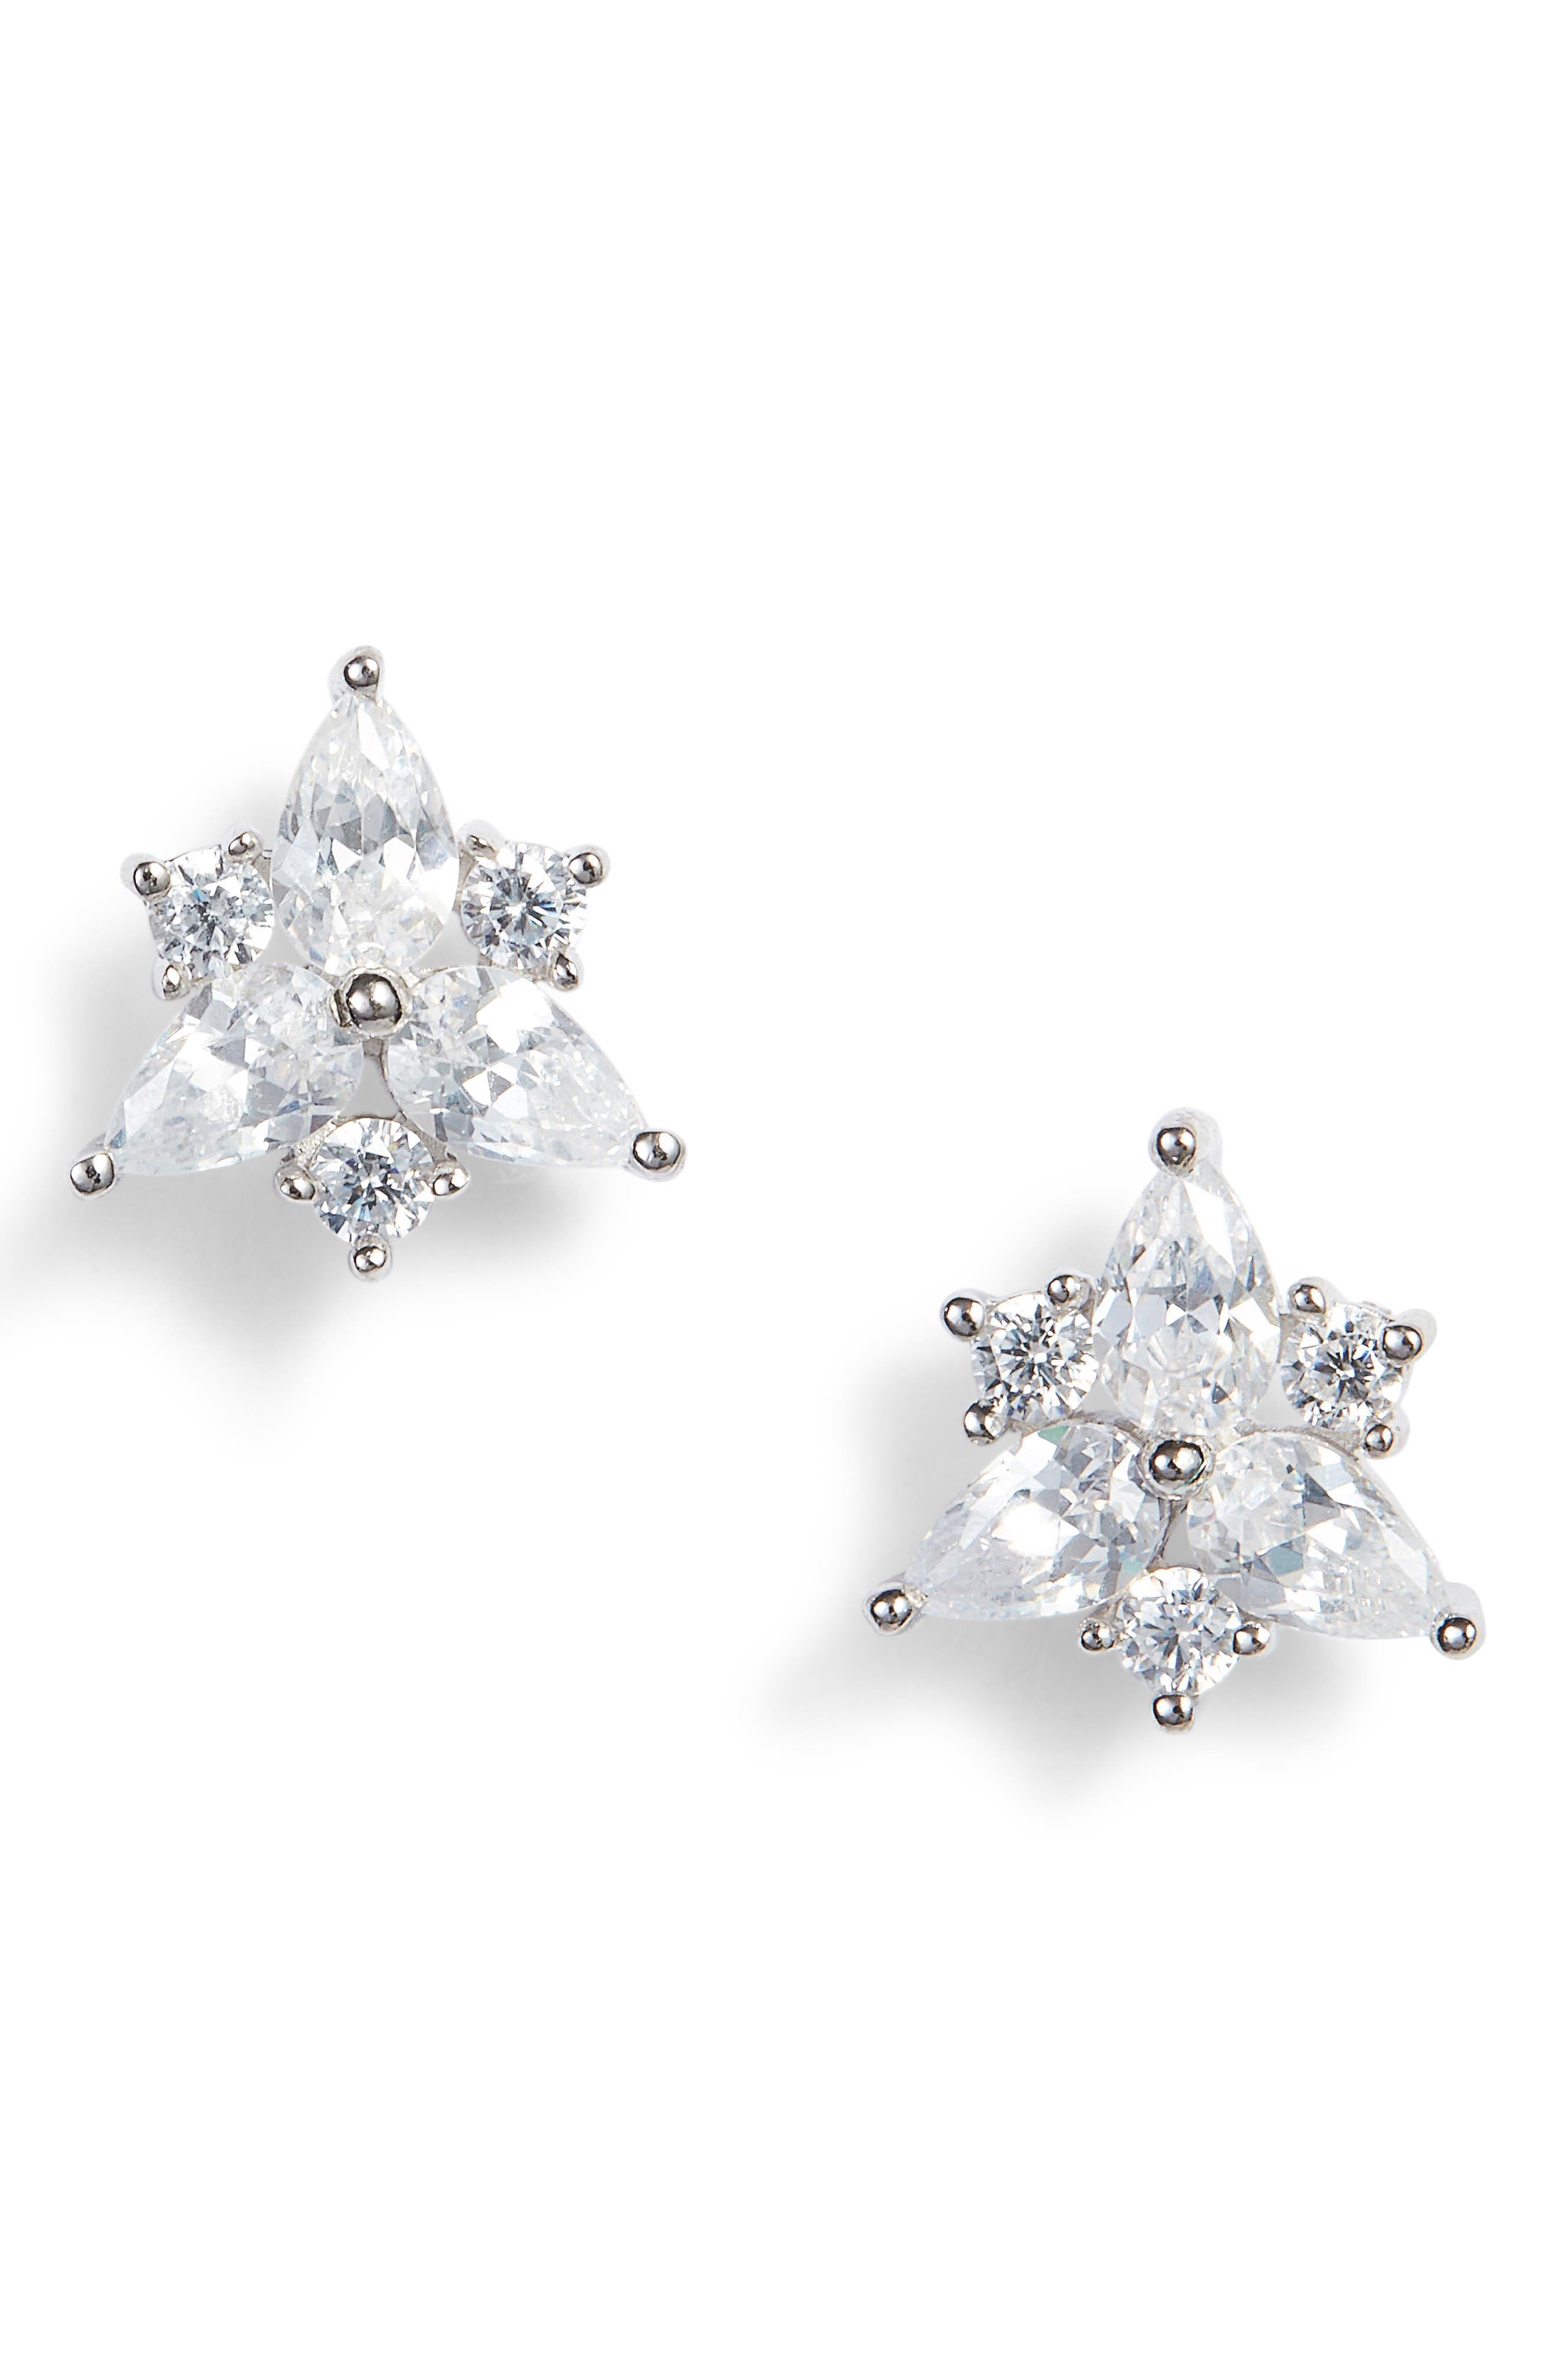 Pear Starburst Stud Earrings,                             Main thumbnail 1, color,                             040